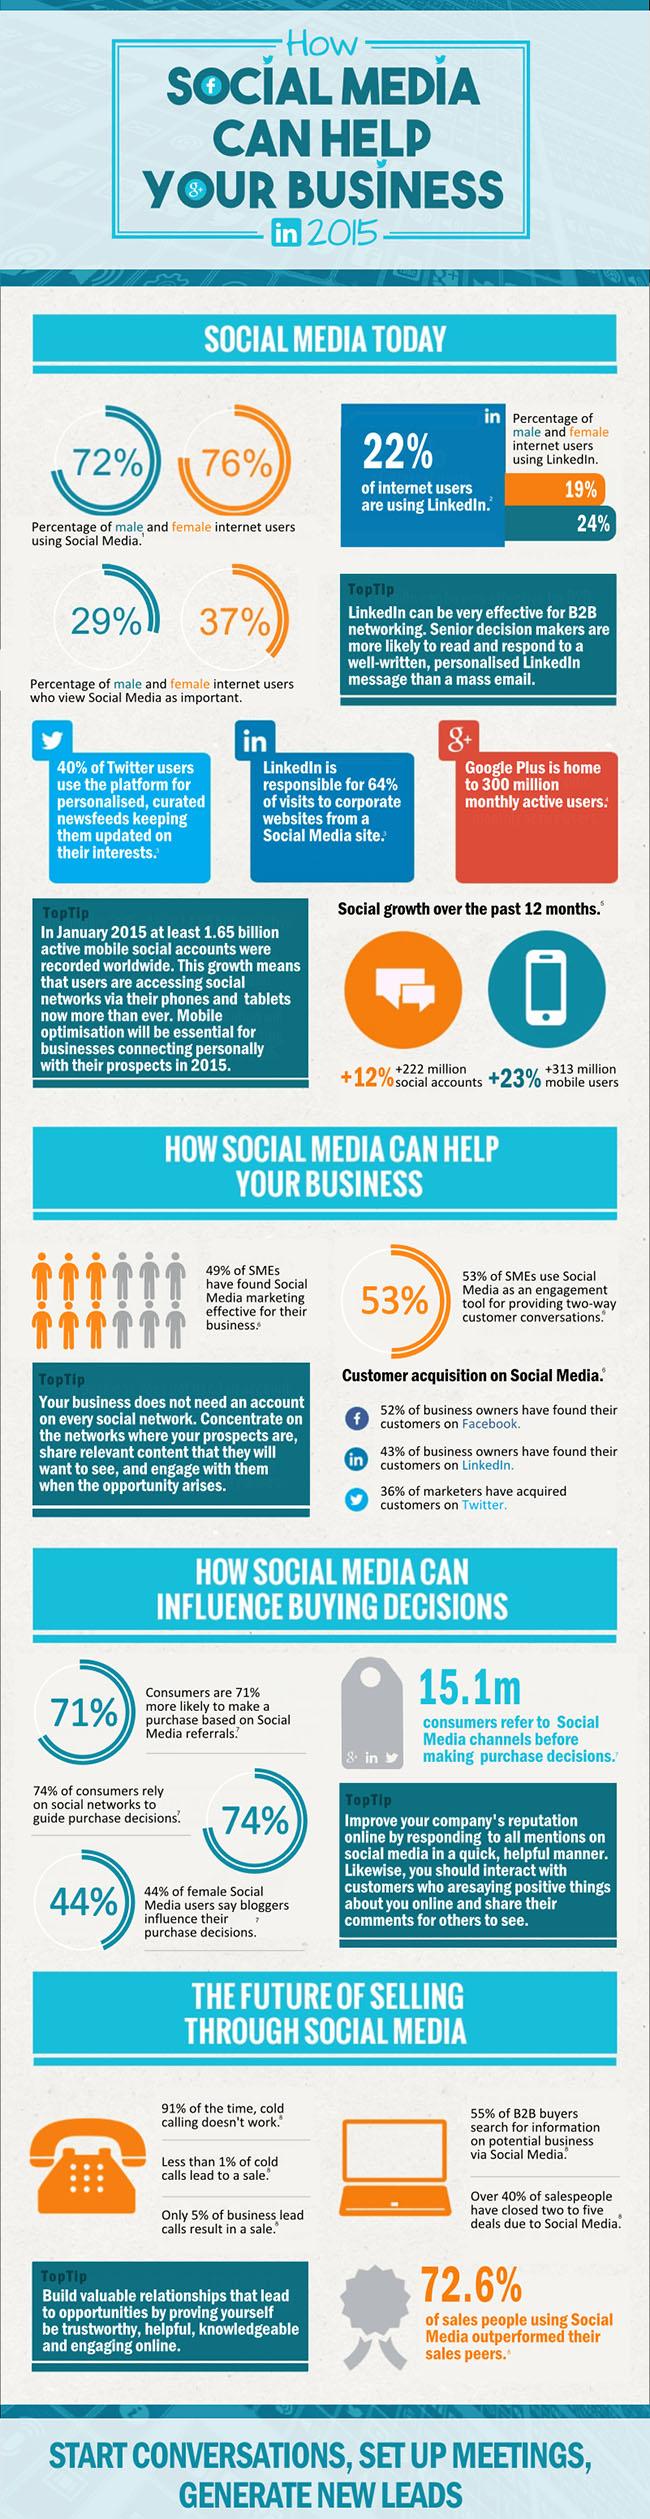 social-media-impact-business-2015